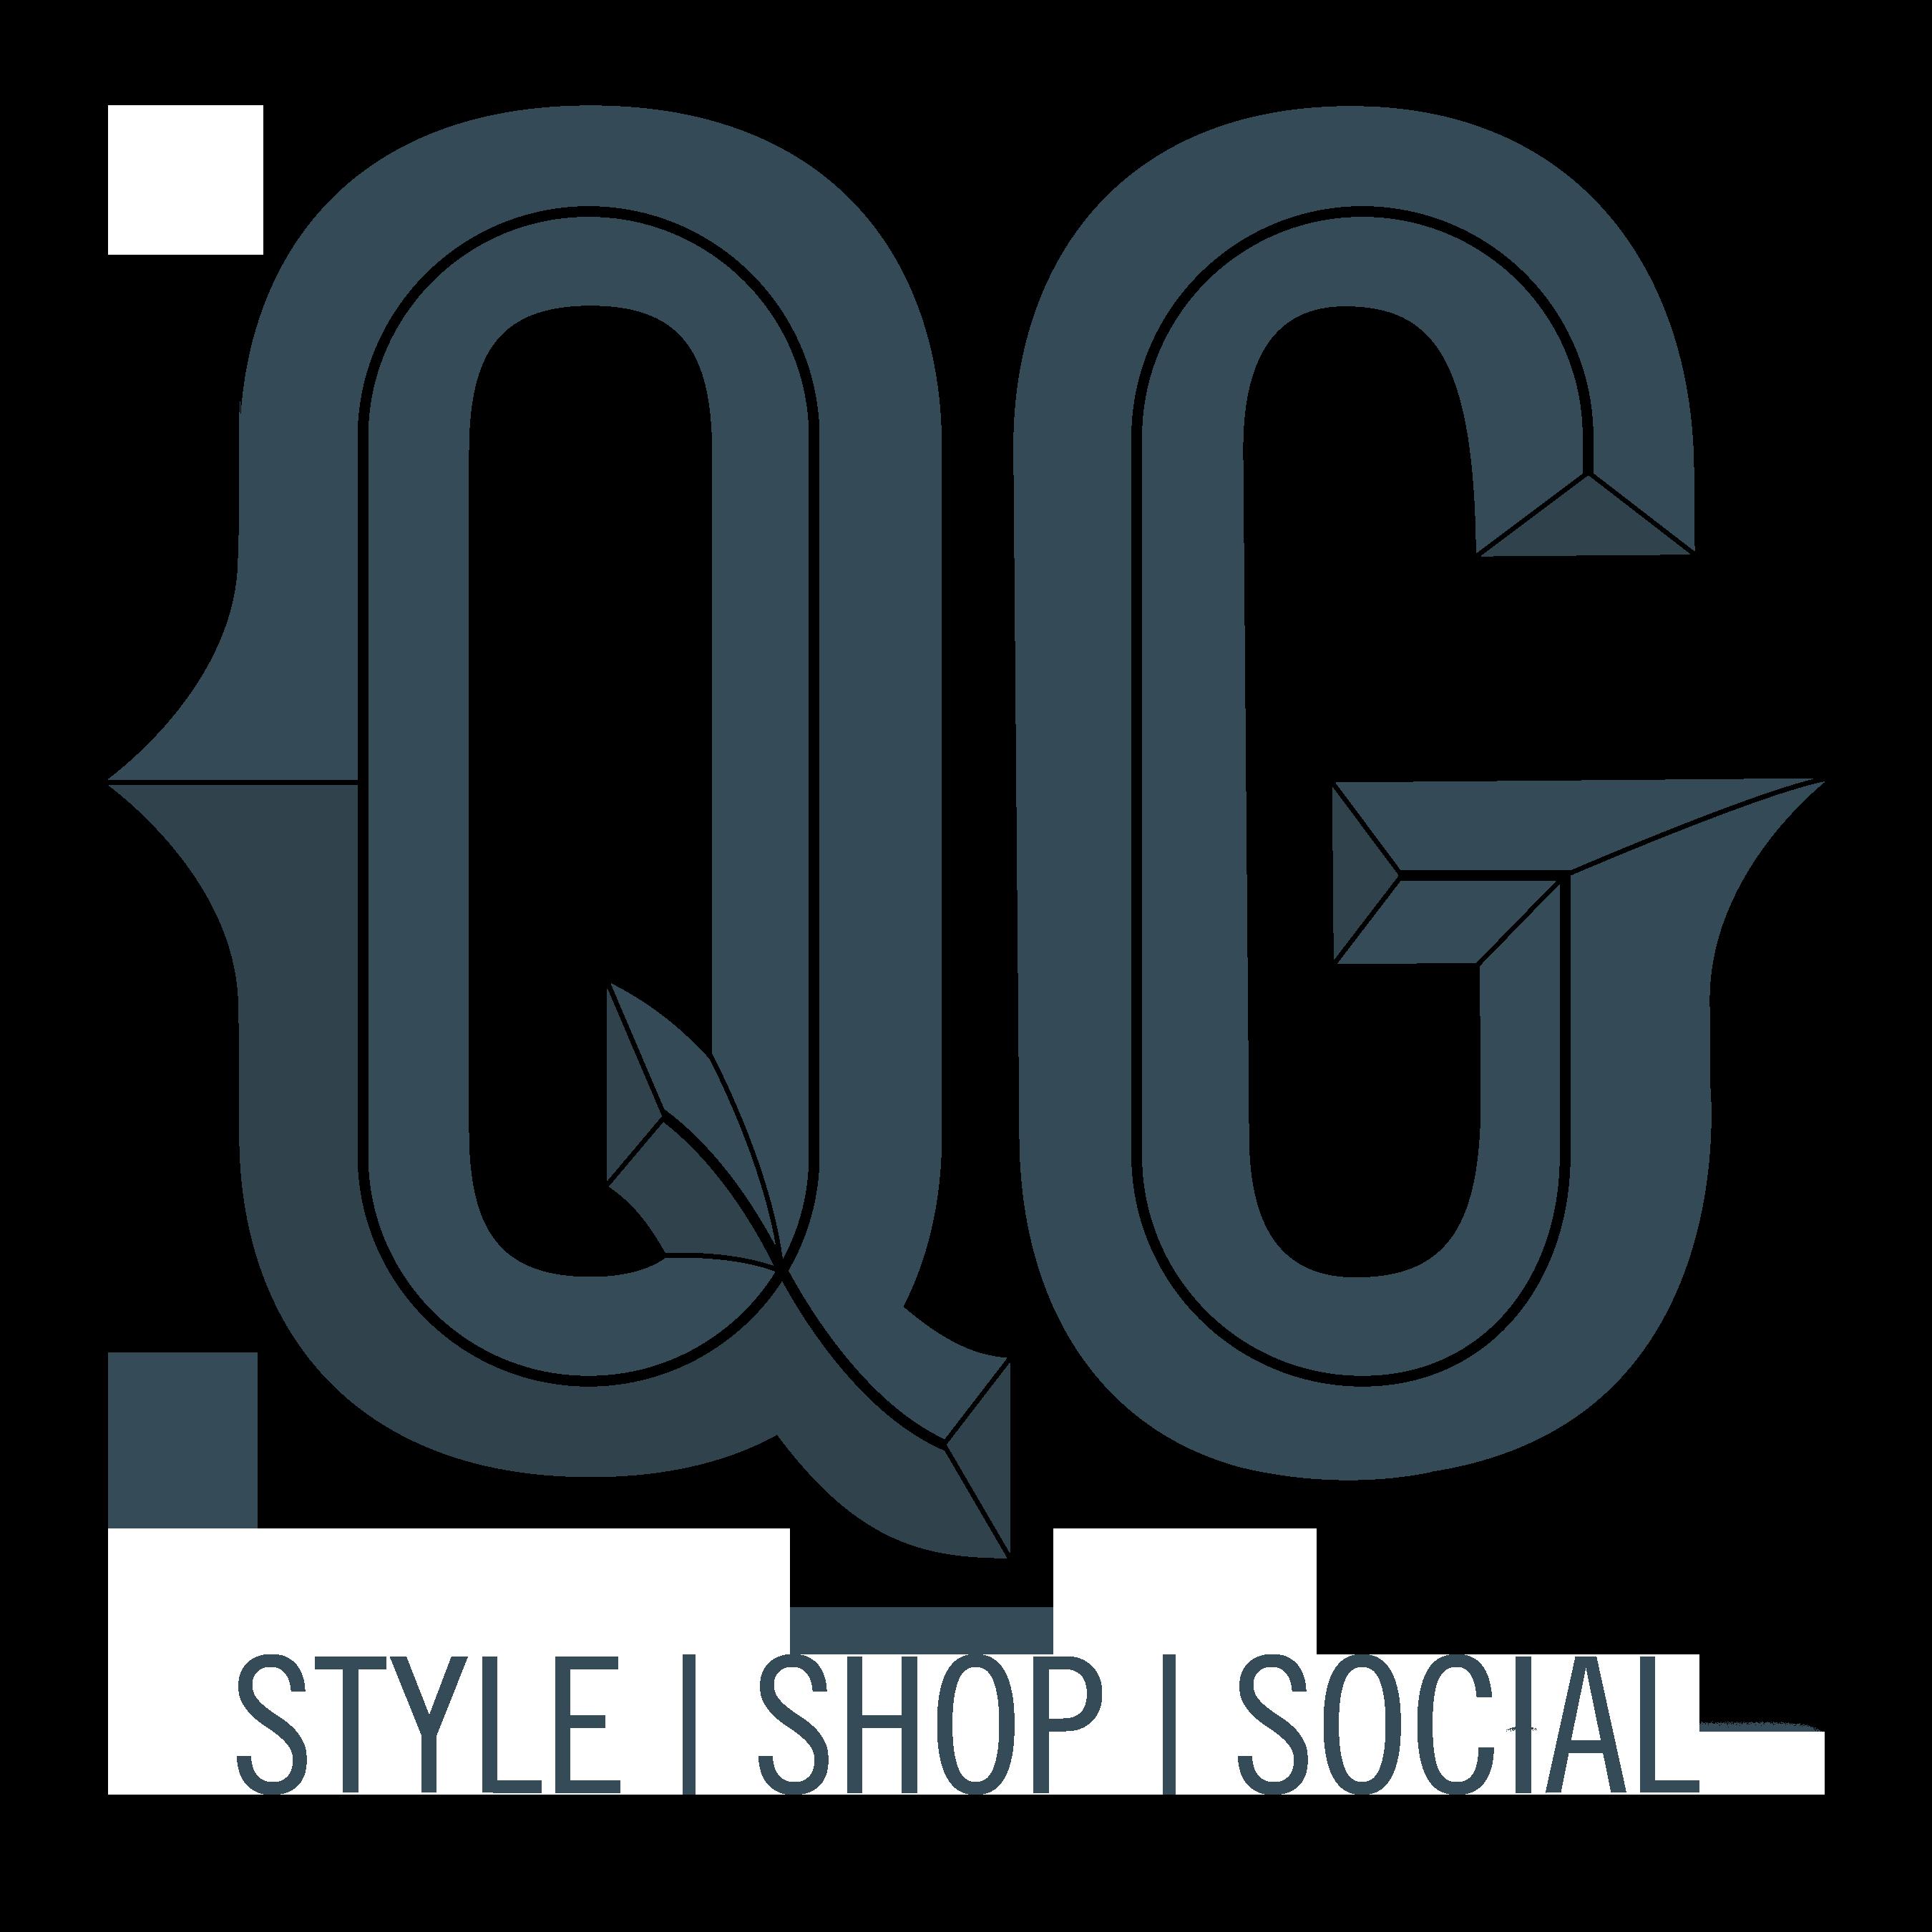 The QG